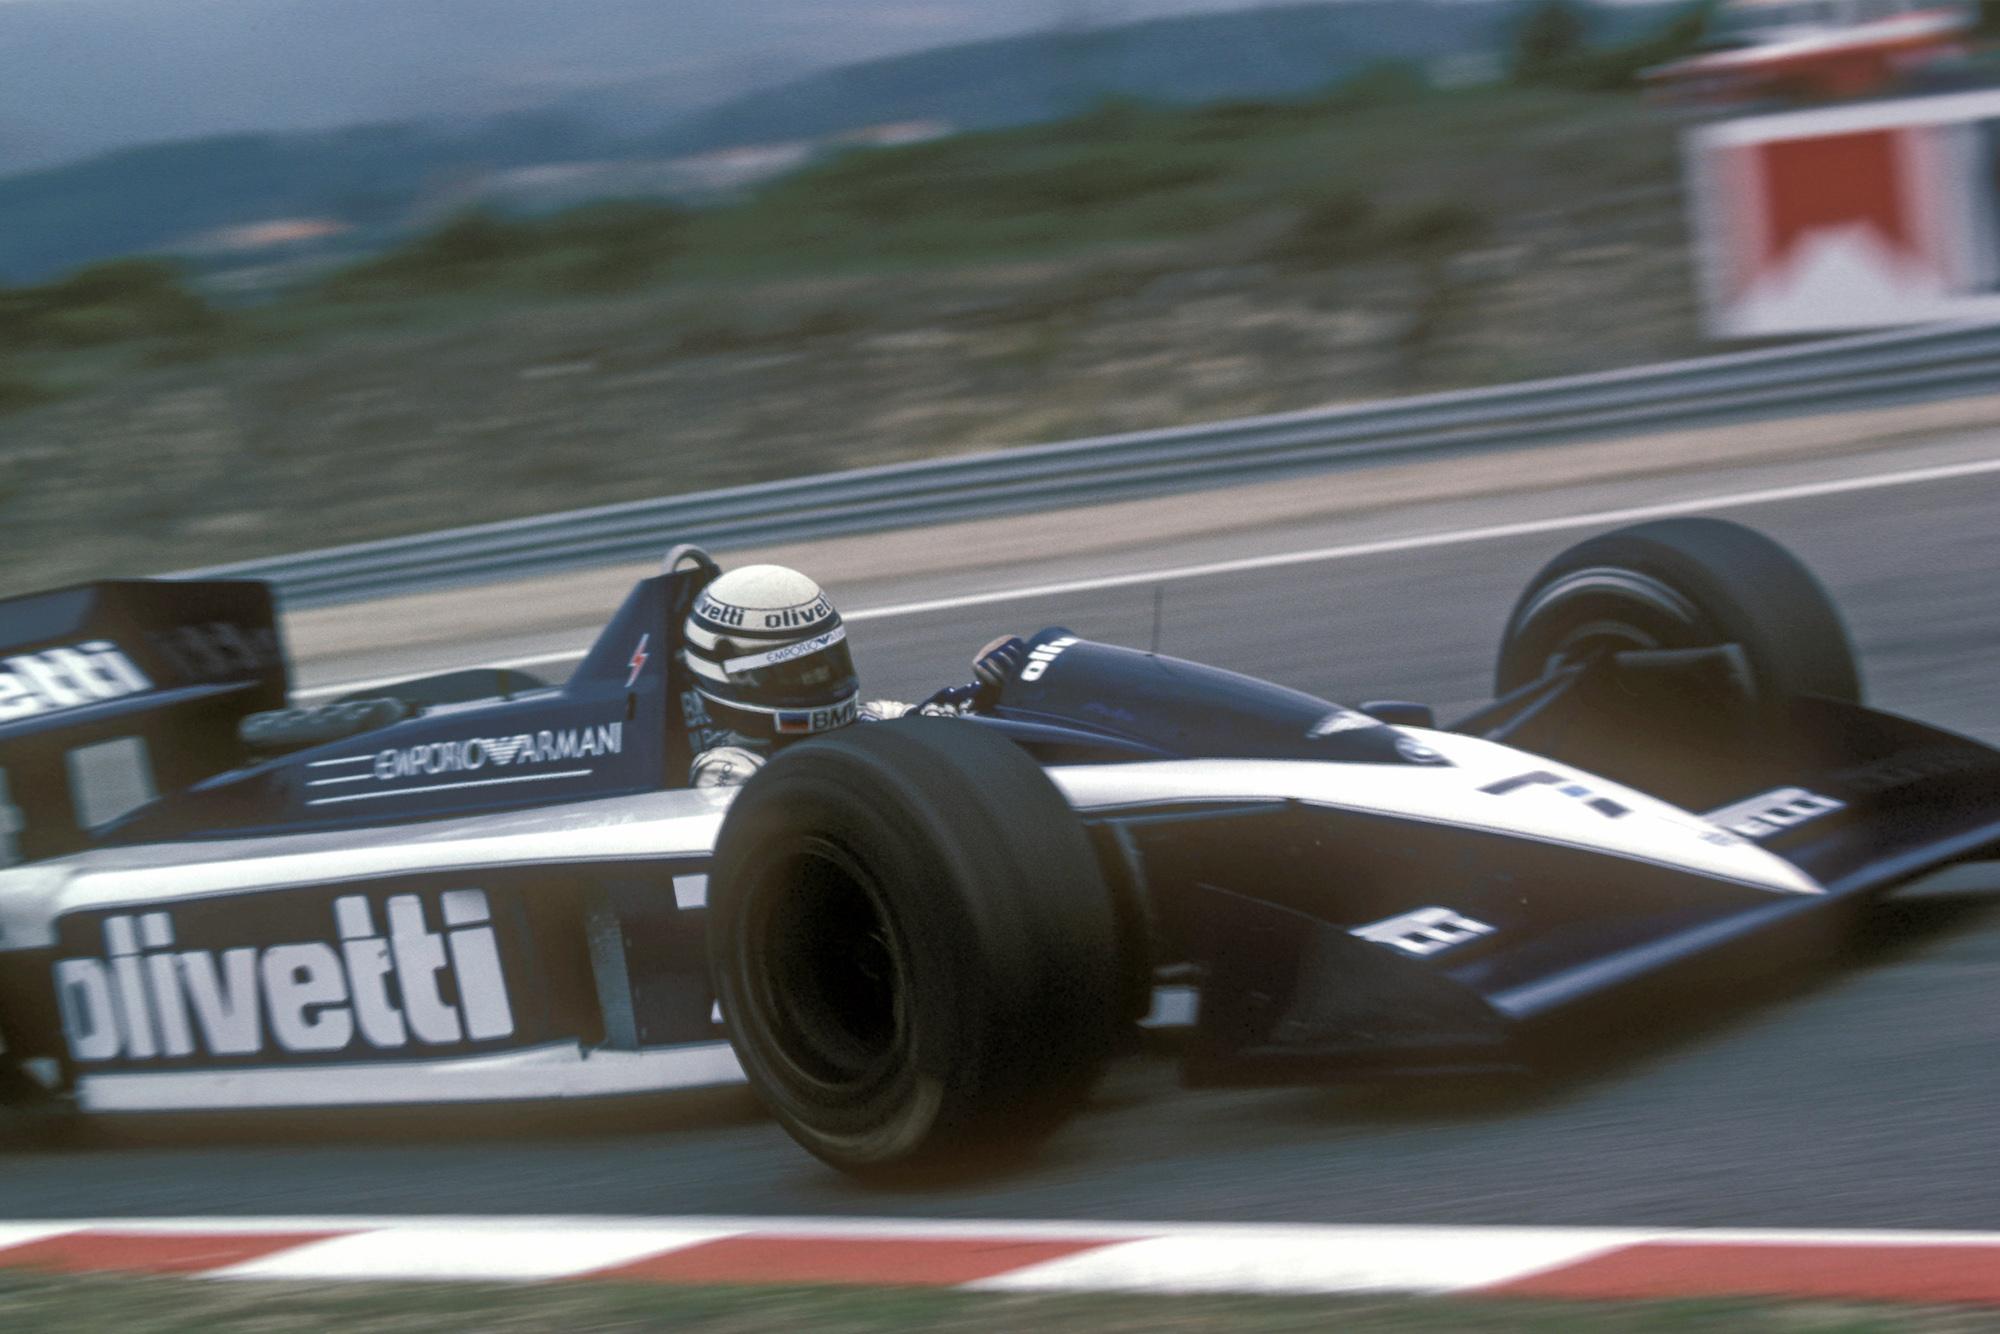 Riccardo Patrese in the Brabham BT55